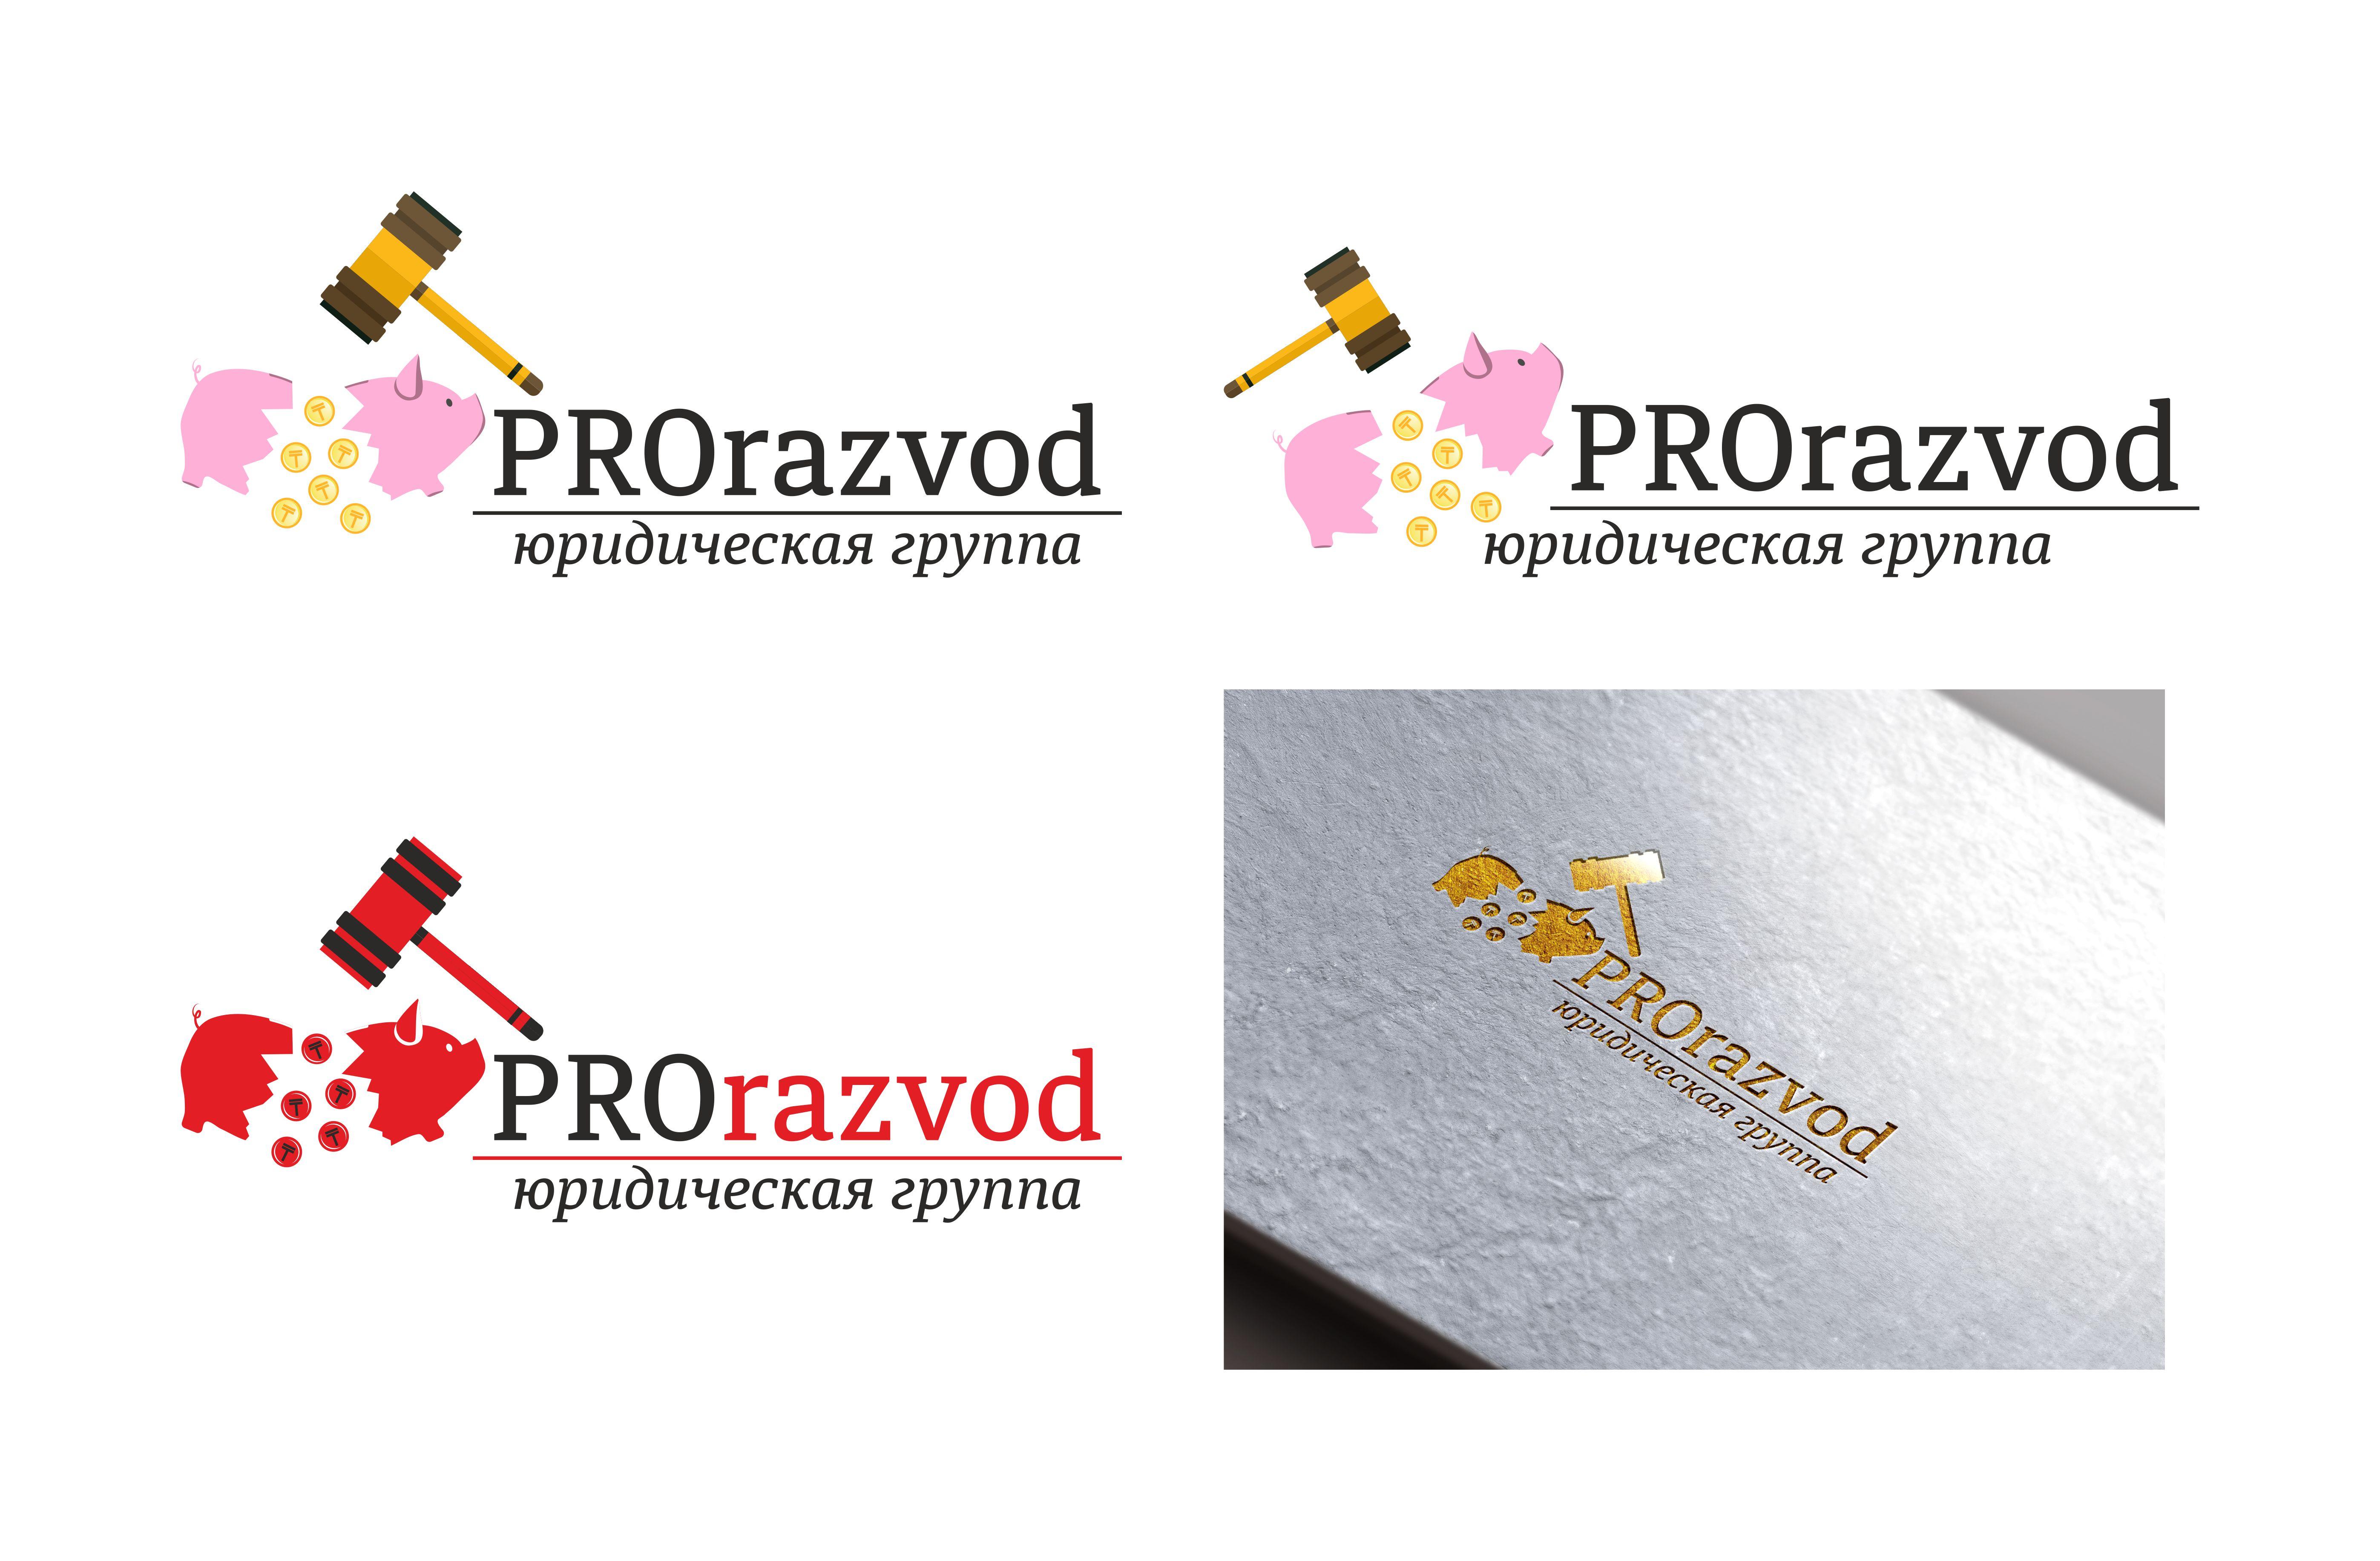 Логотип и фирм стиль для бракоразводного агенства. фото f_5255878a8d8516e5.jpg